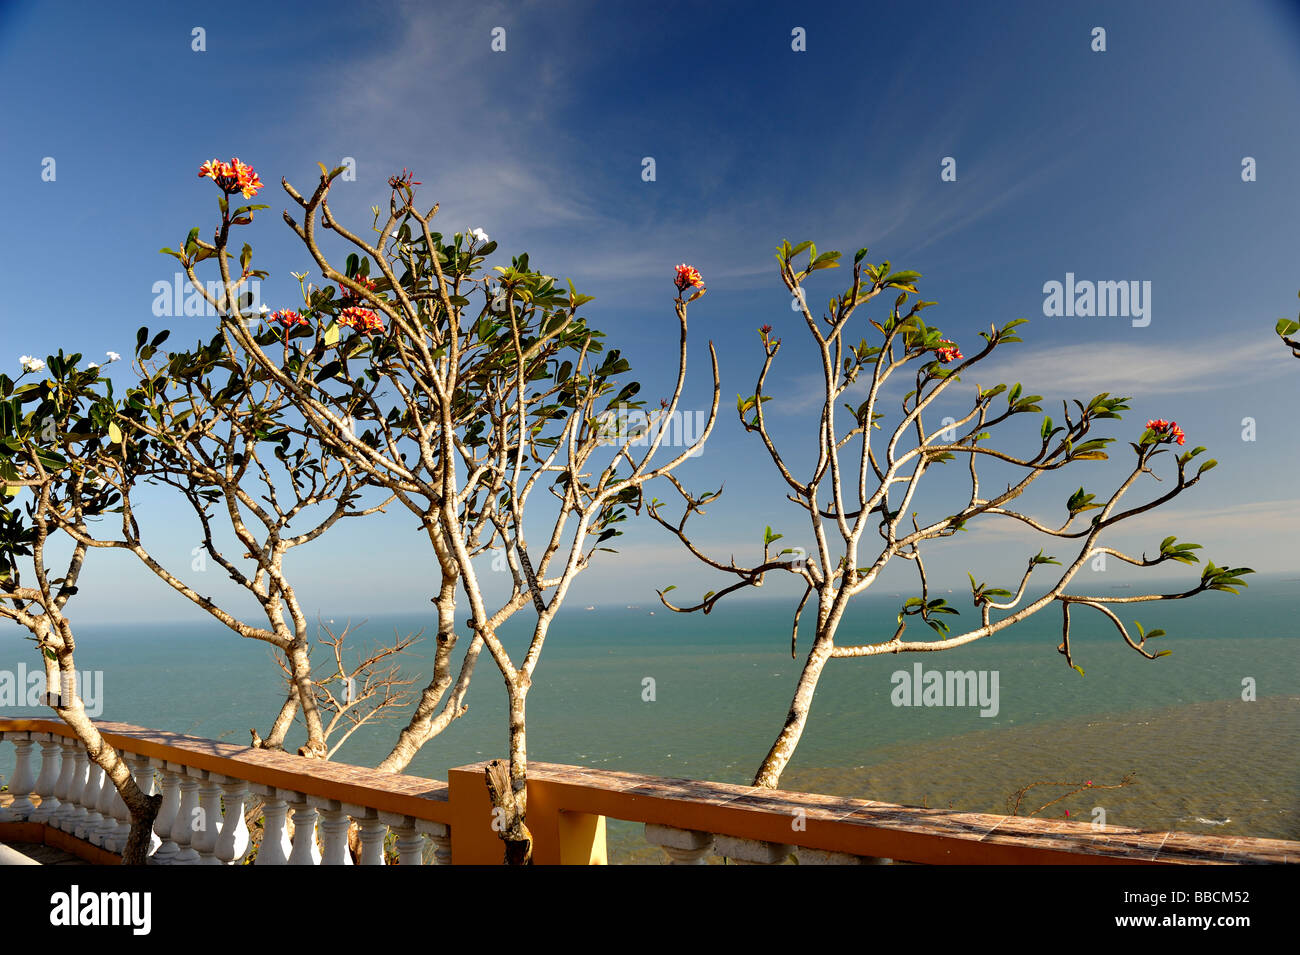 Frangipani trees and balcony overlooking the South China Sea. Vung Tau, Vietnam - Stock Image